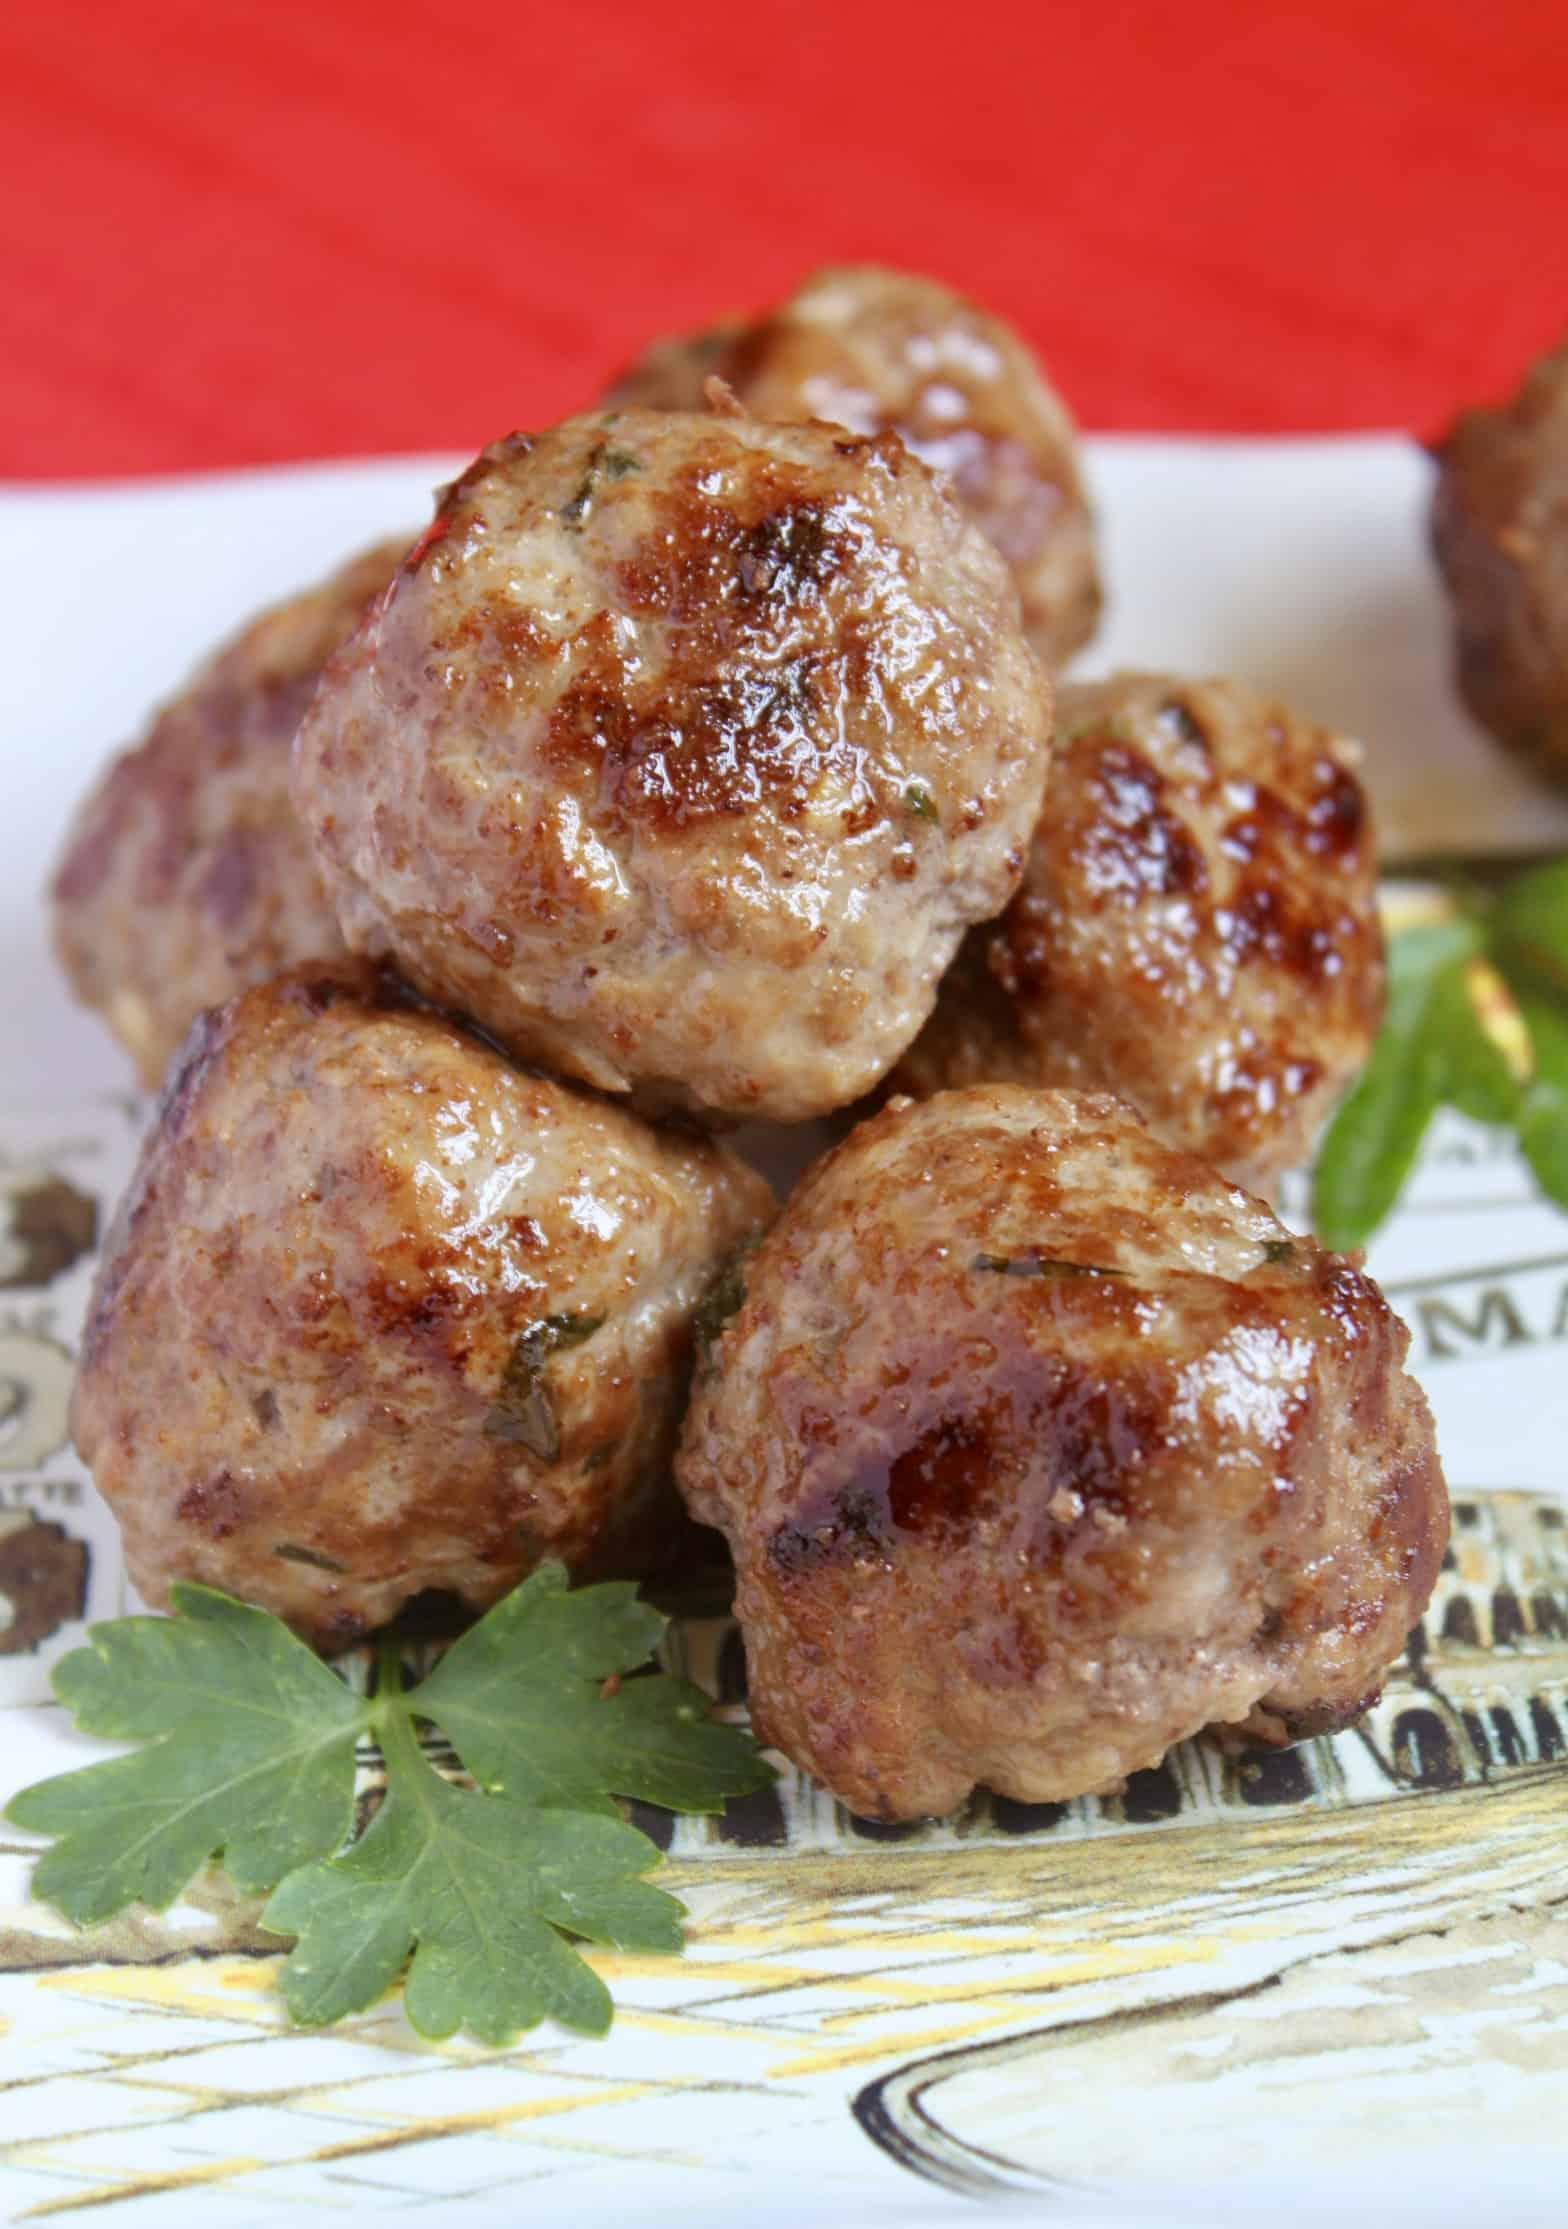 How to Make Meatballs (Italian Meatball Recipe)